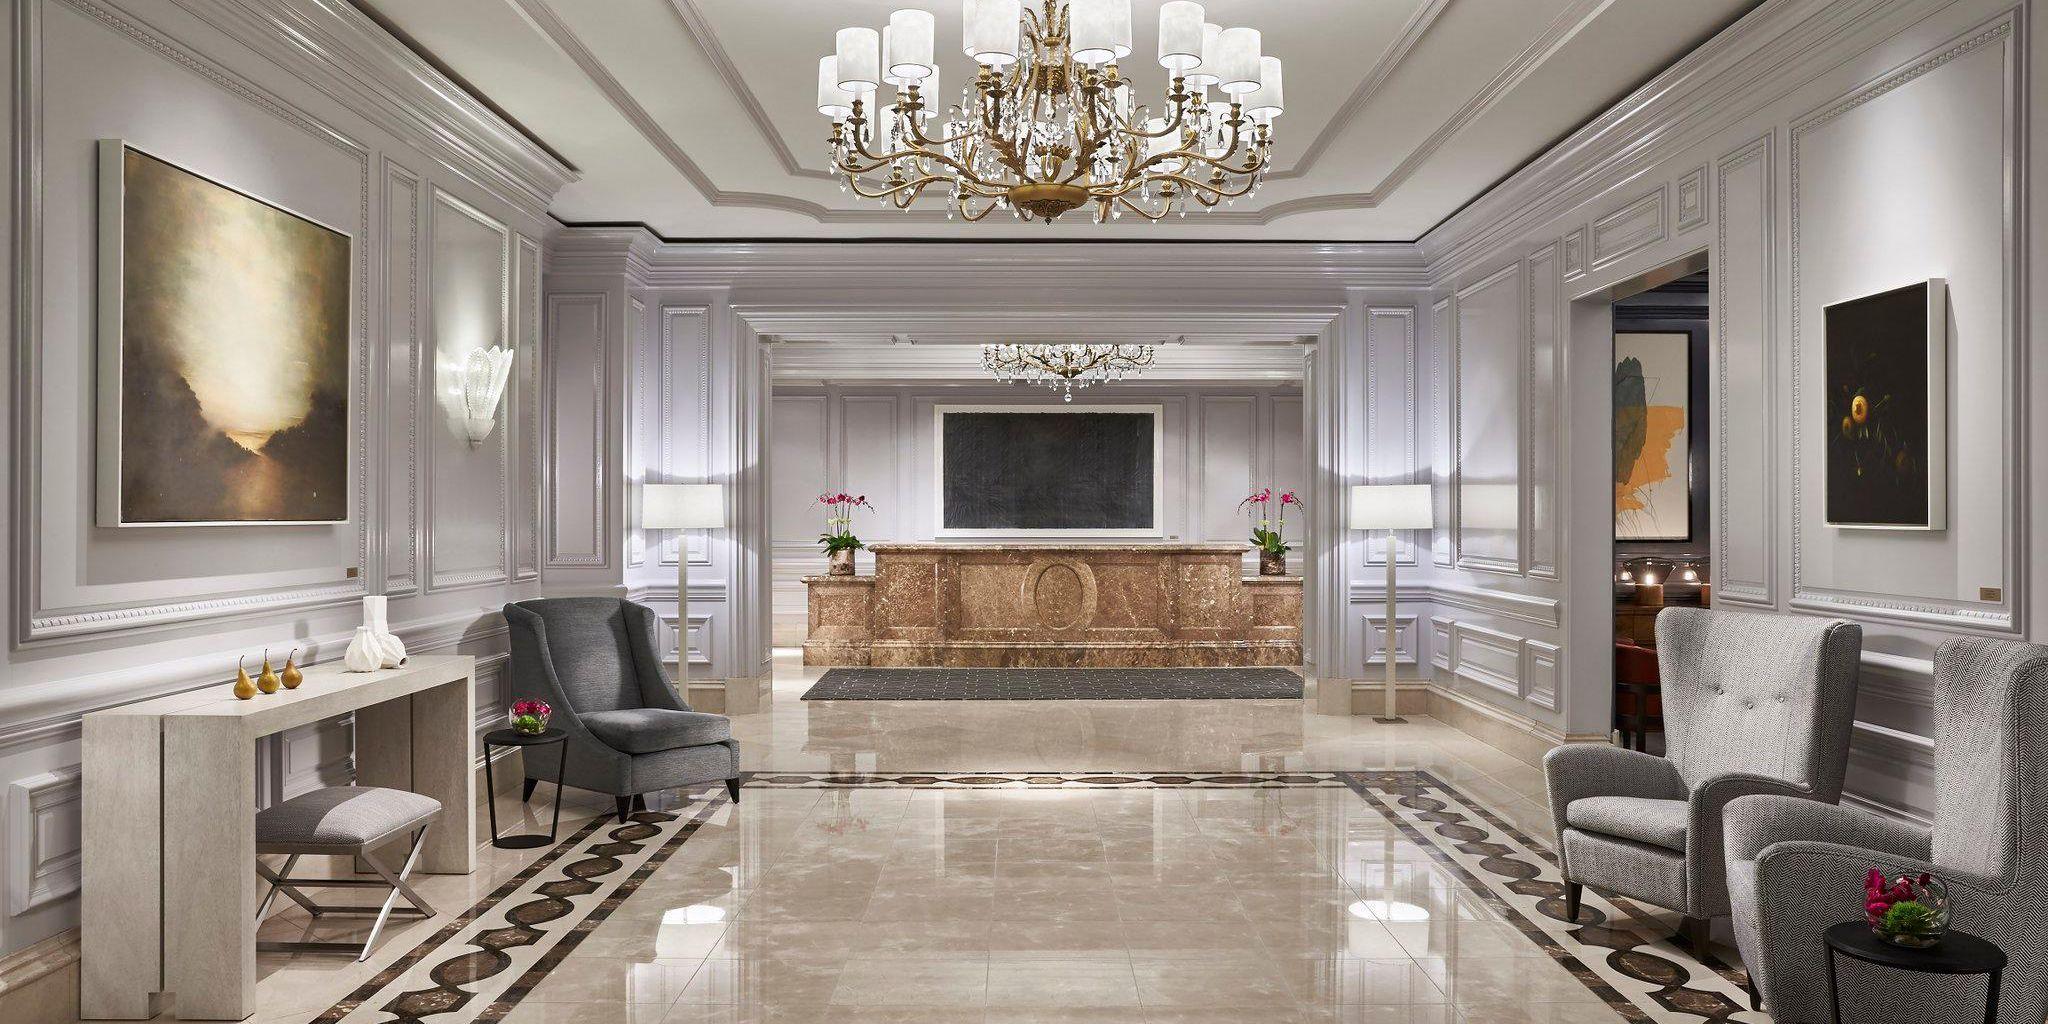 The Ritz-Carlton, Washington, DC